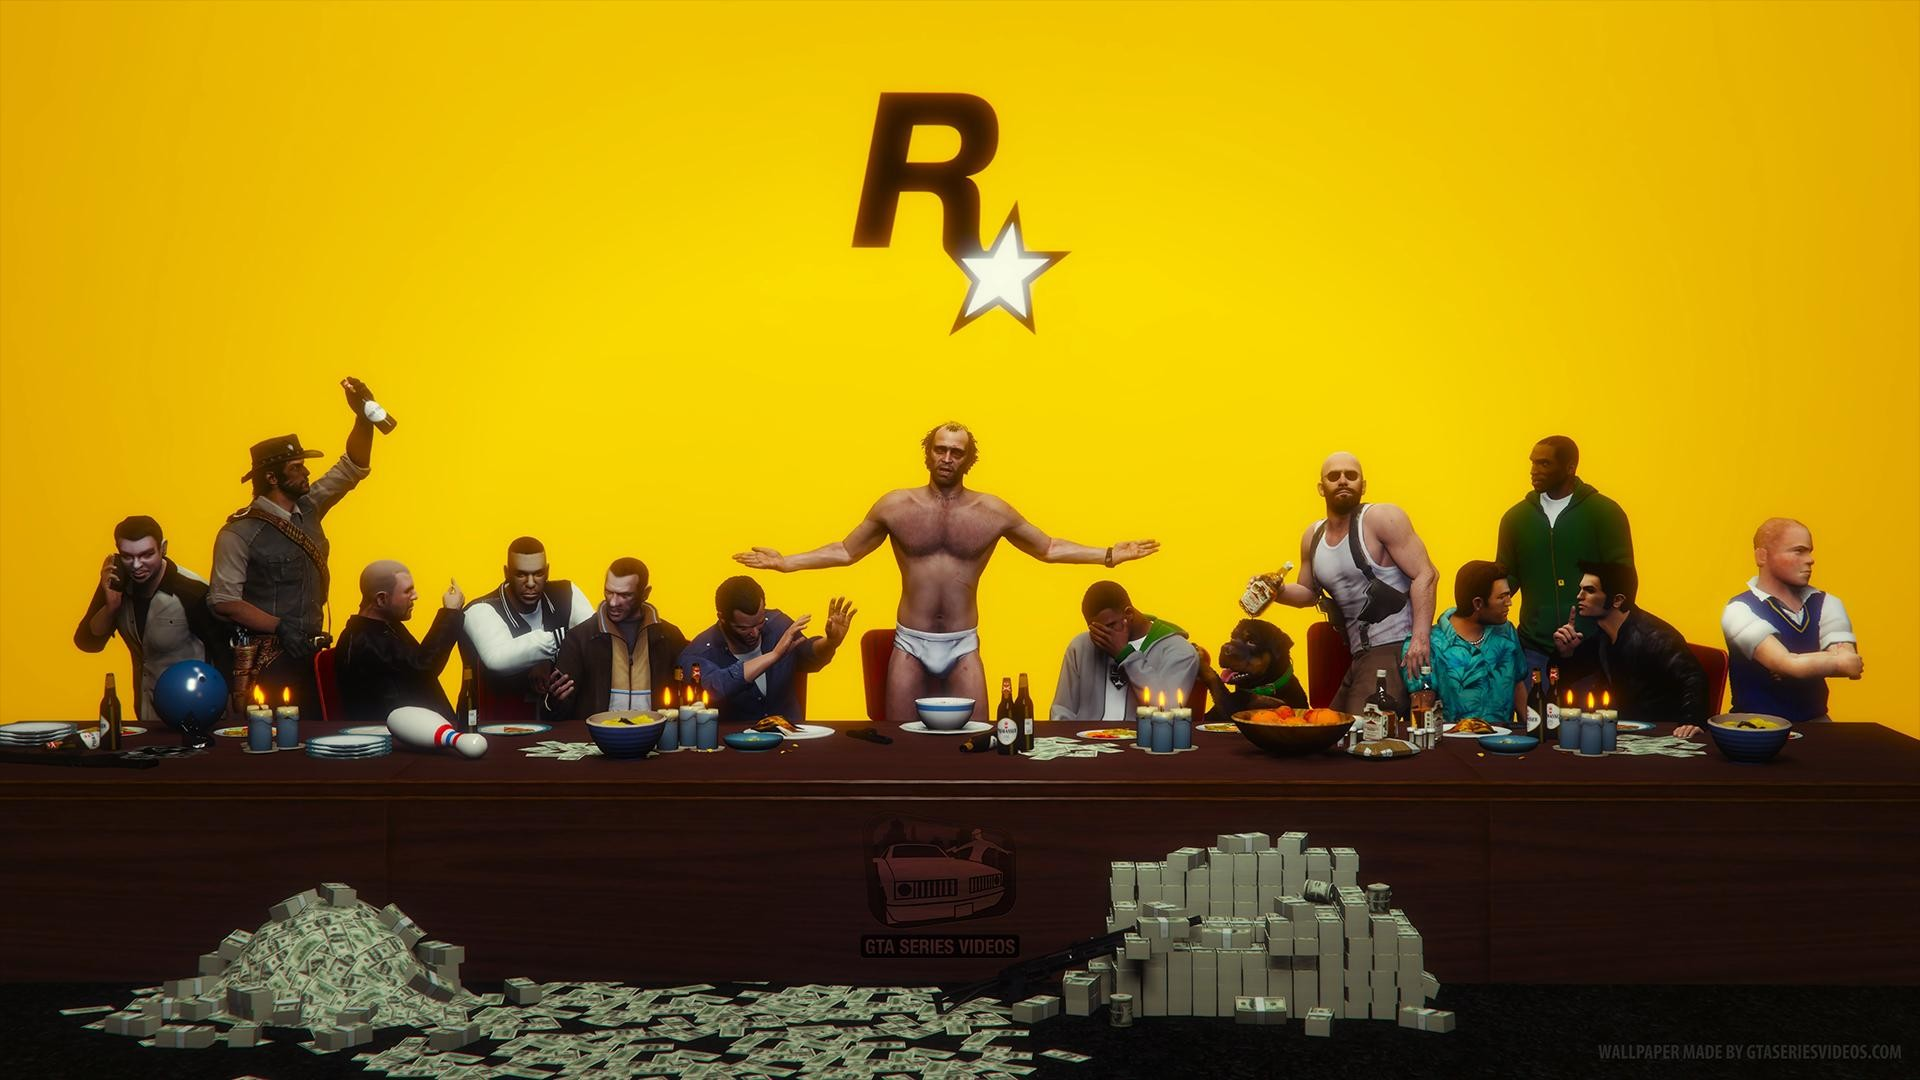 Rockstar Games The Last Supper …